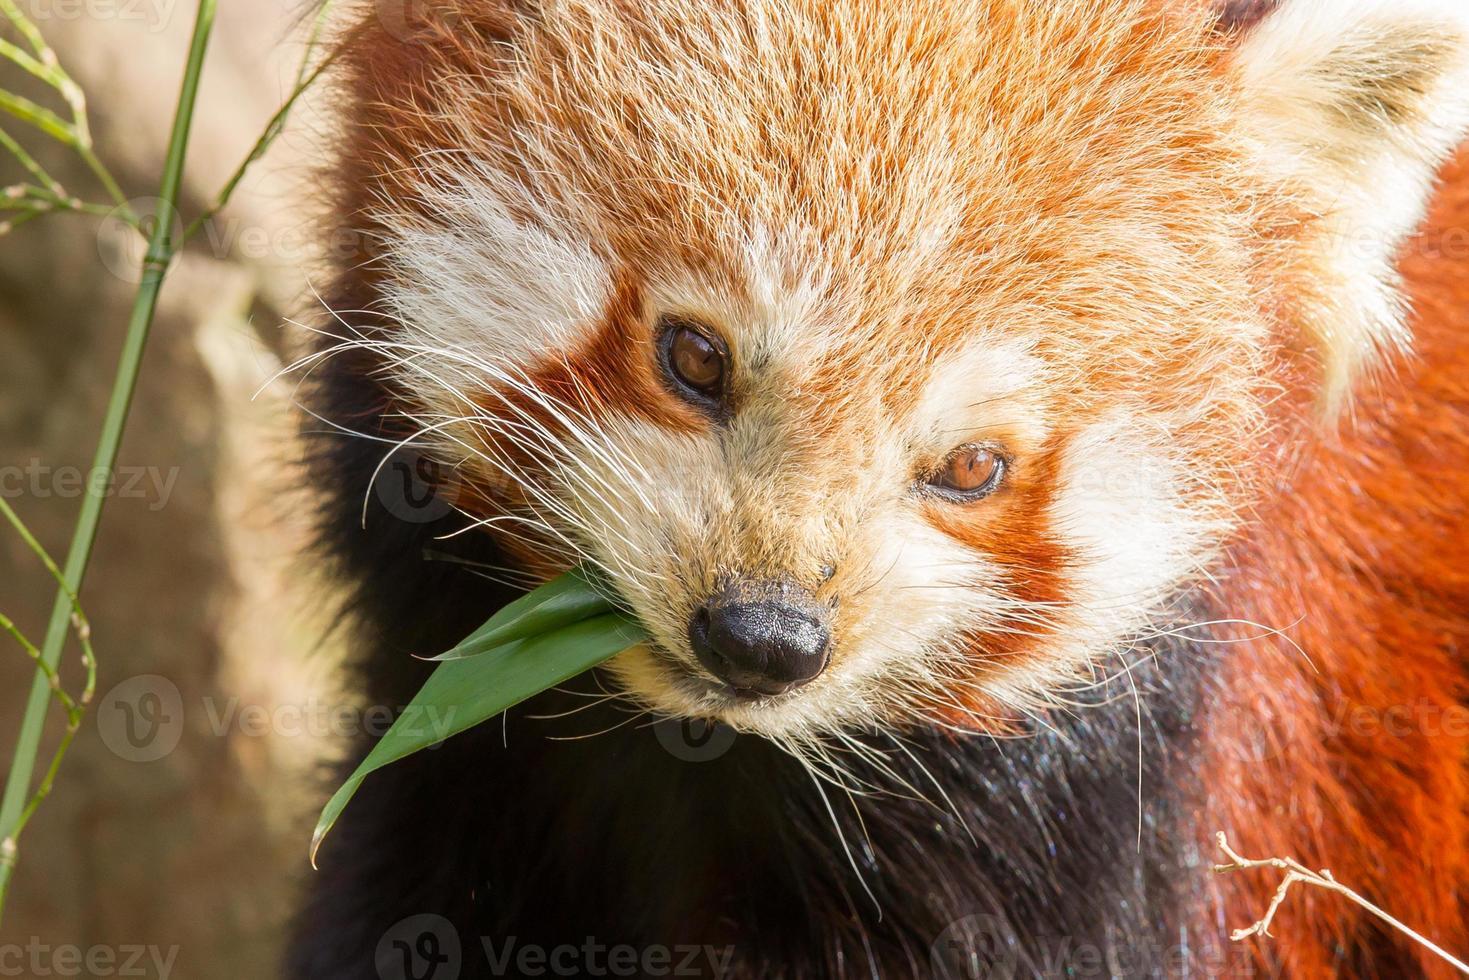 o panda vermelho, firefox foto